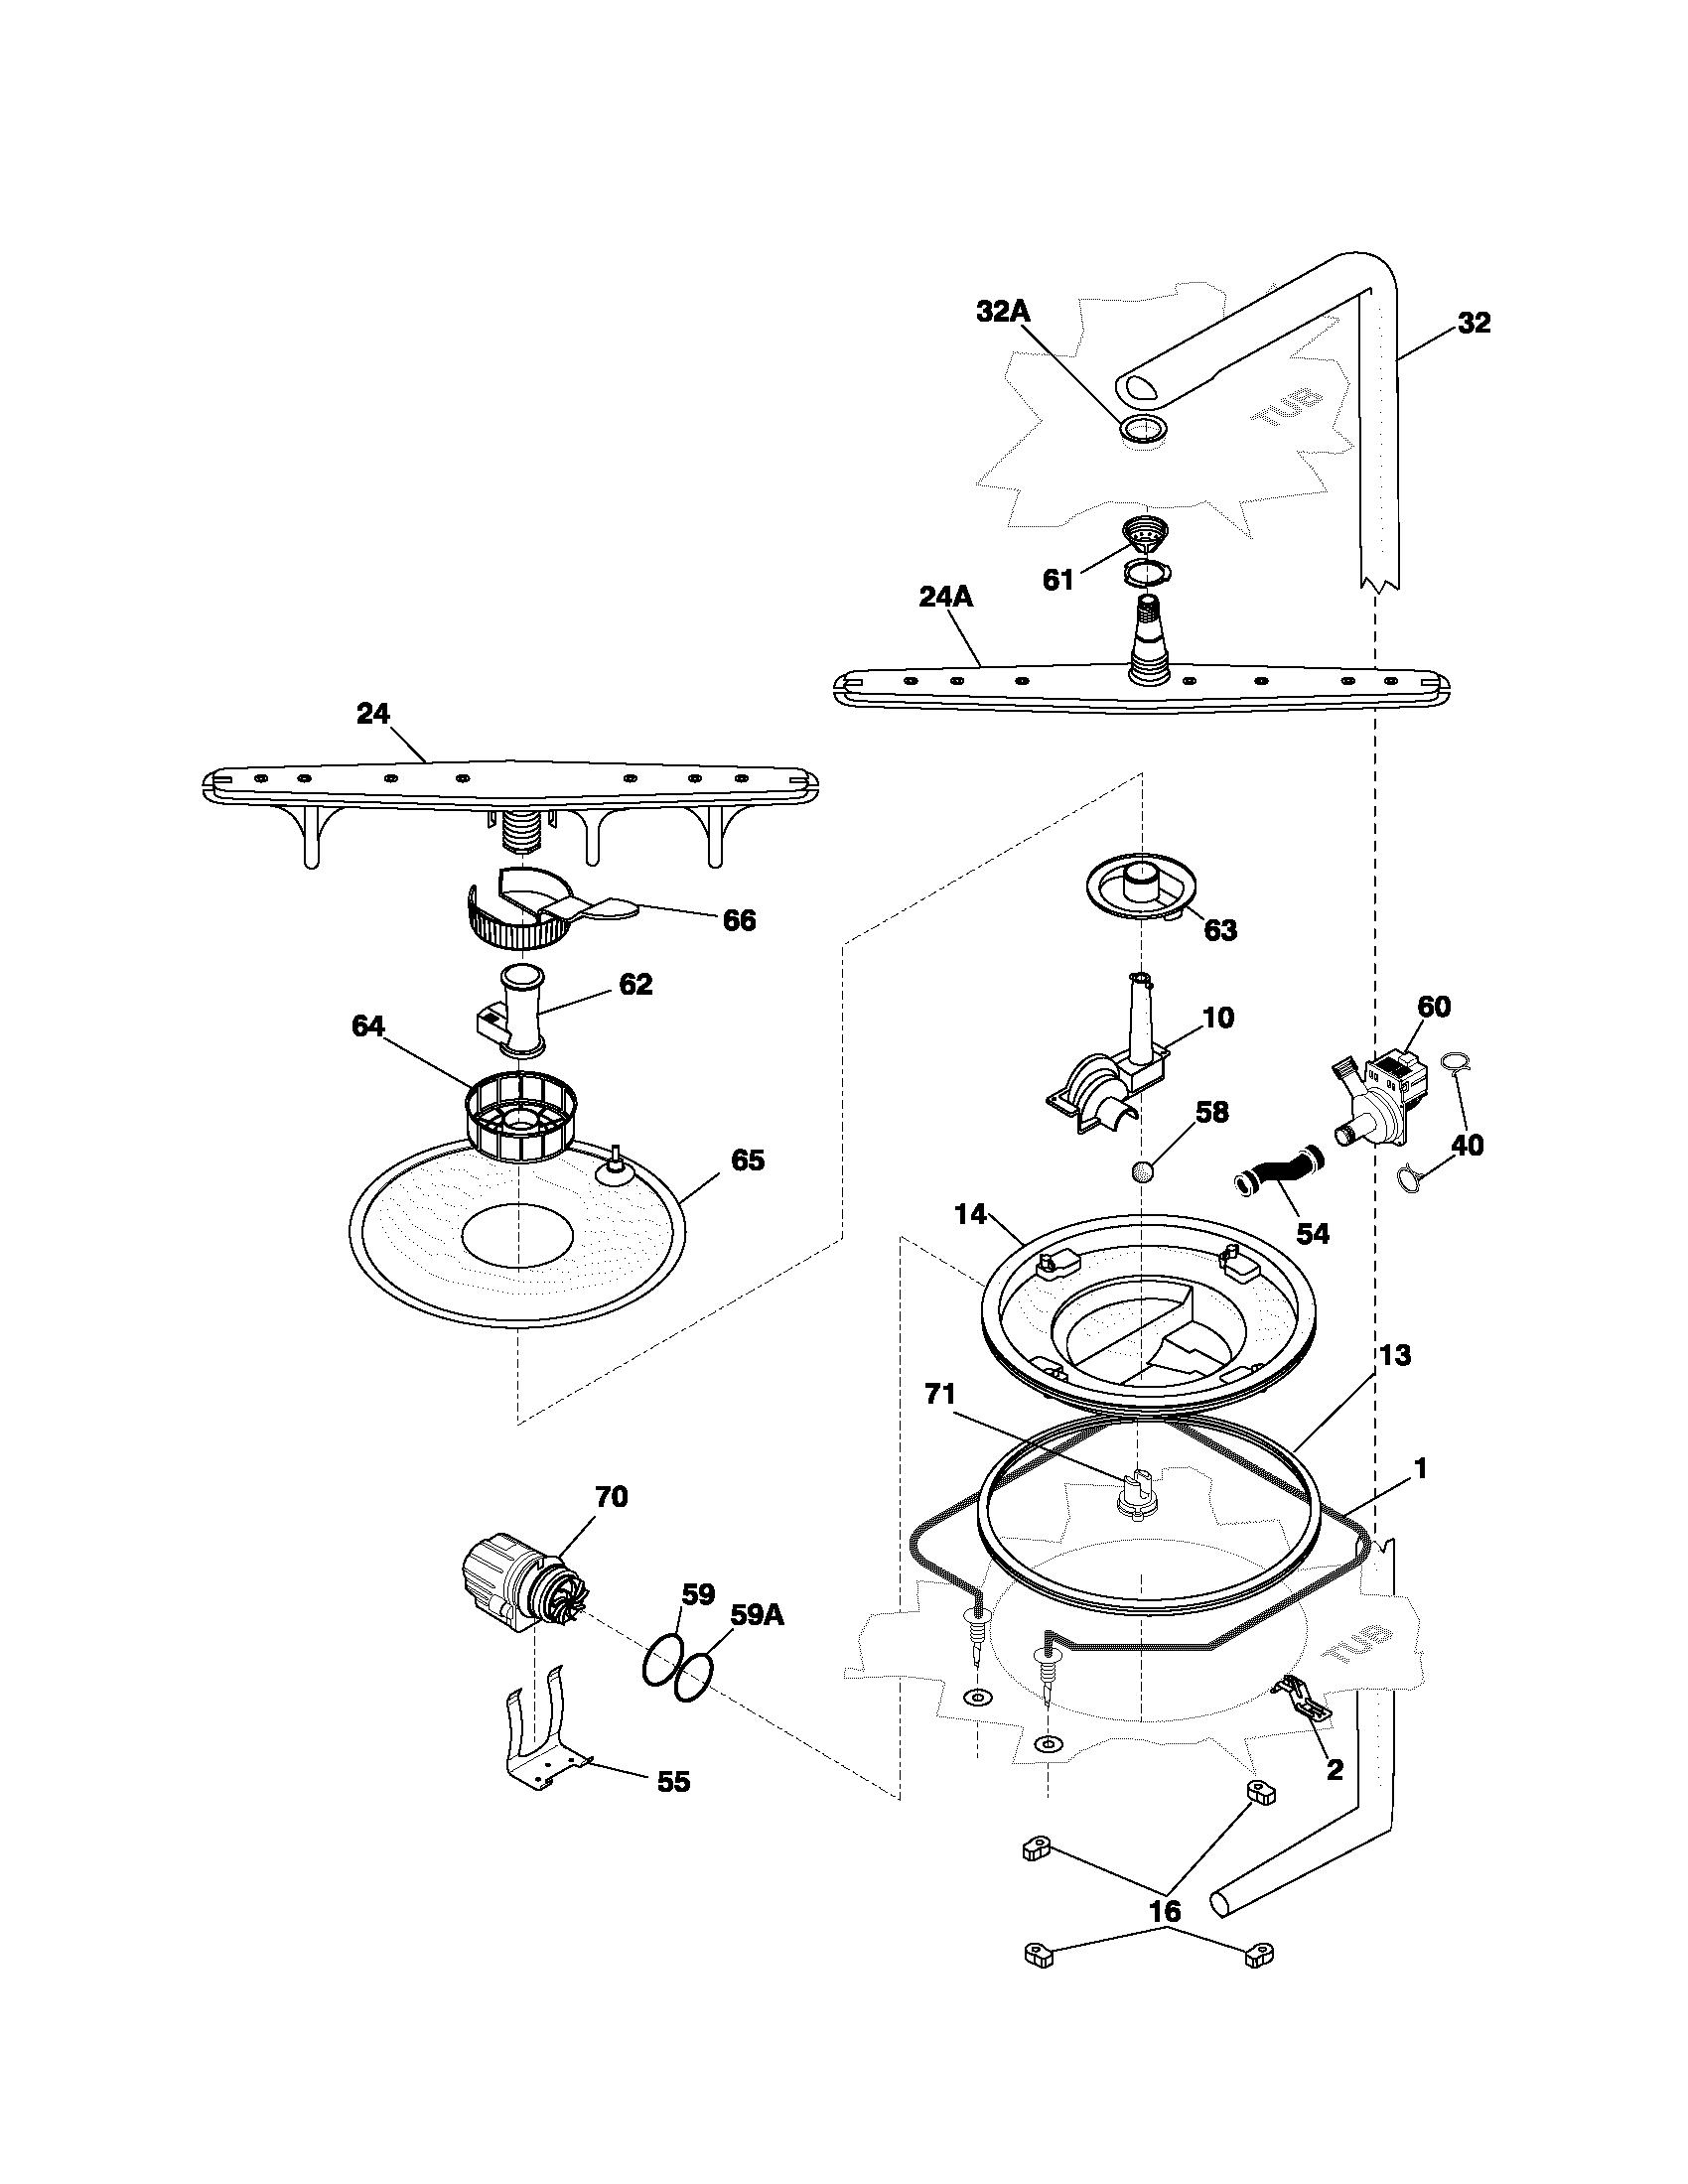 Wiring Dishwasher Code Electrical Diagram Bathroom Ontario Frigidaire Pldb998cc0 Timer Stove Clocks And Appliance Canada